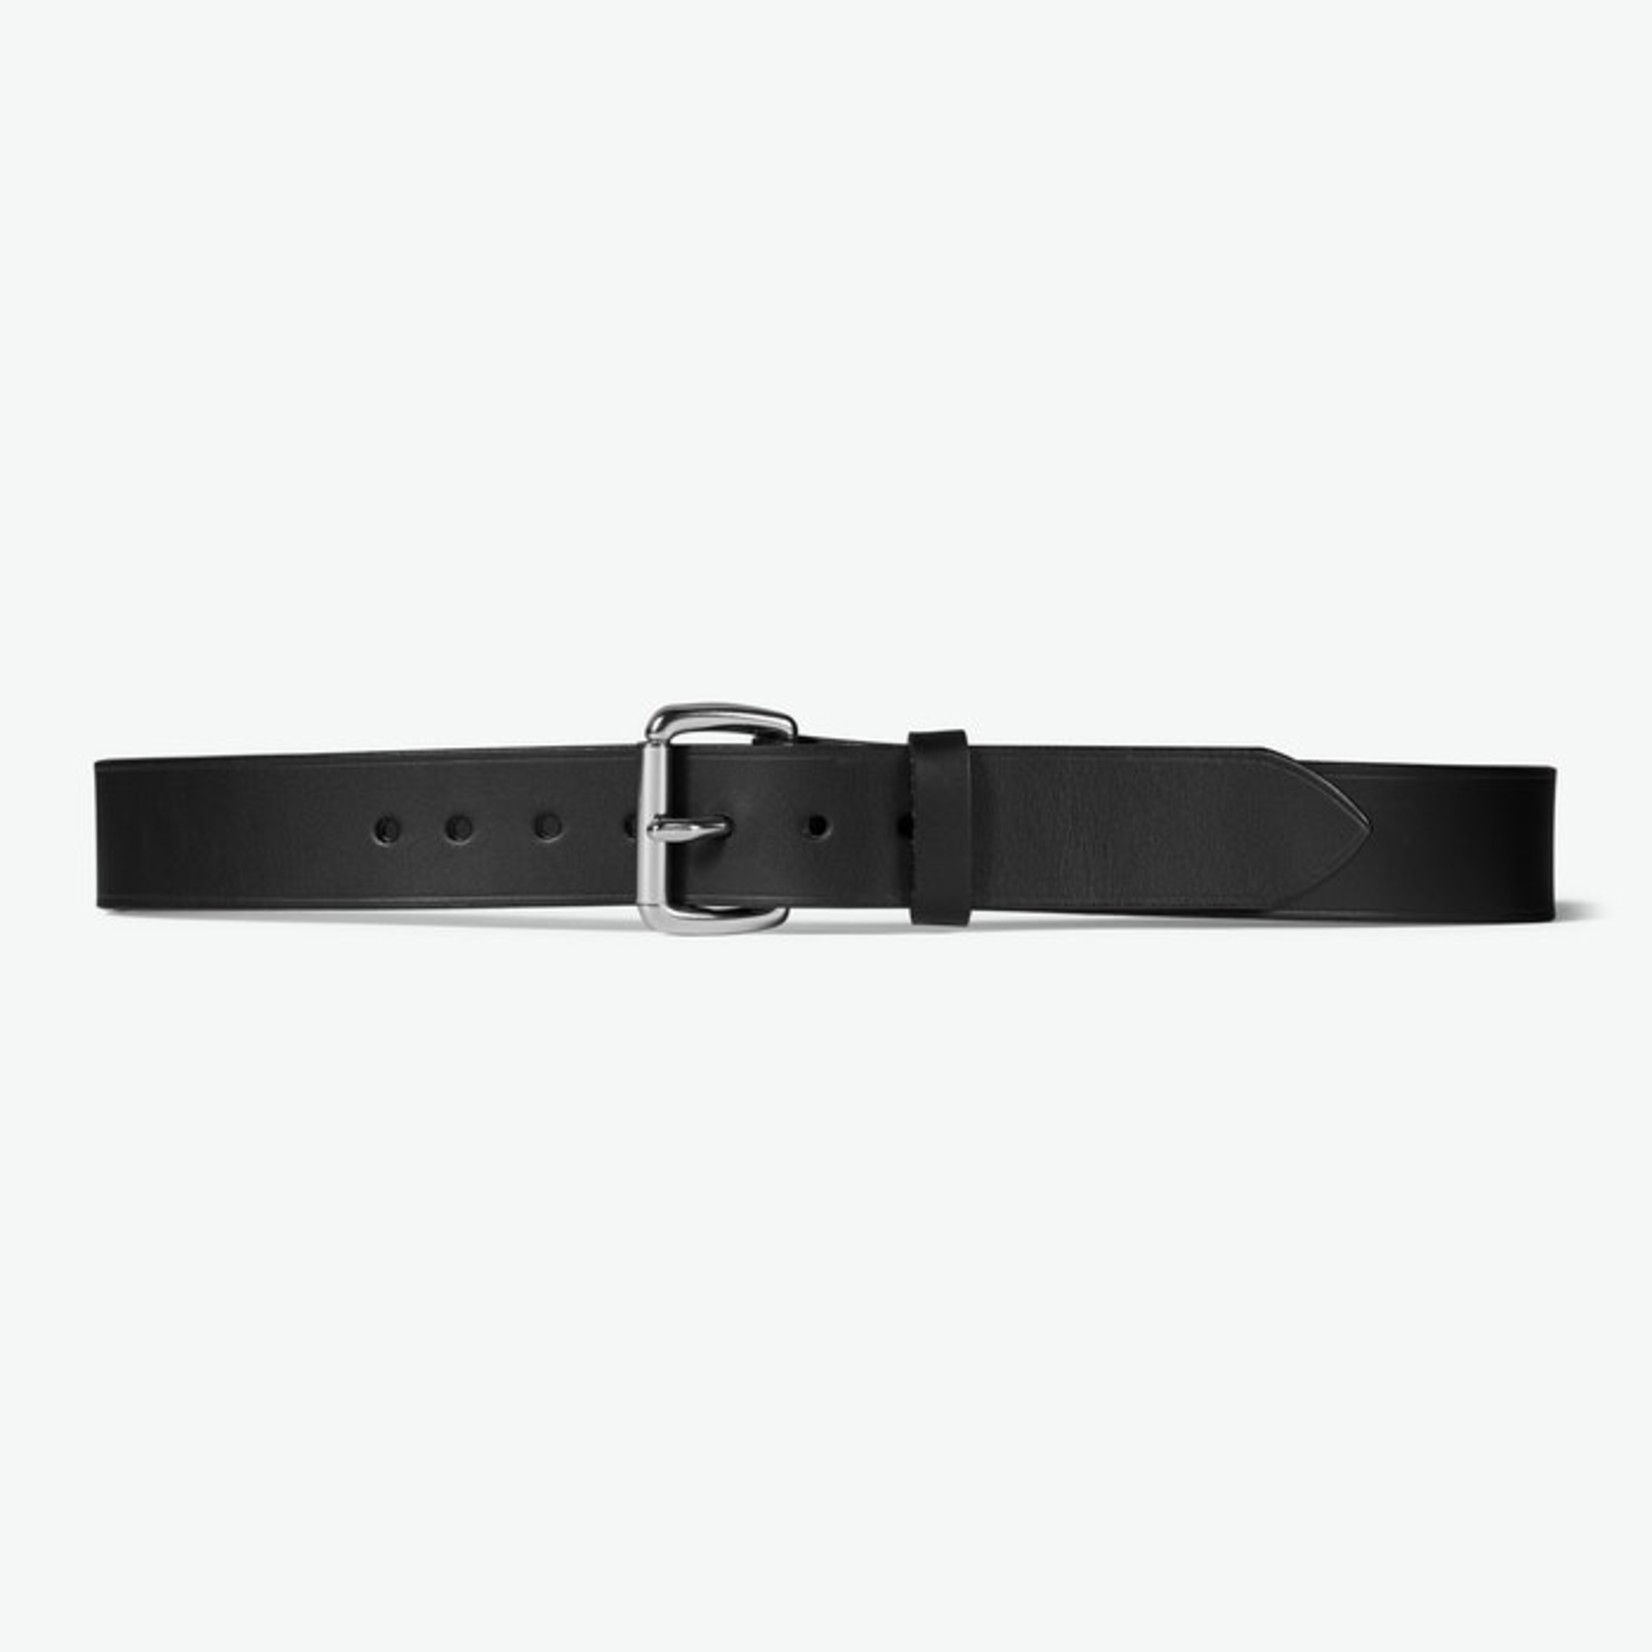 "Filson Filson 11063202 1-1/2"" Leather Belt - 4 Styles"